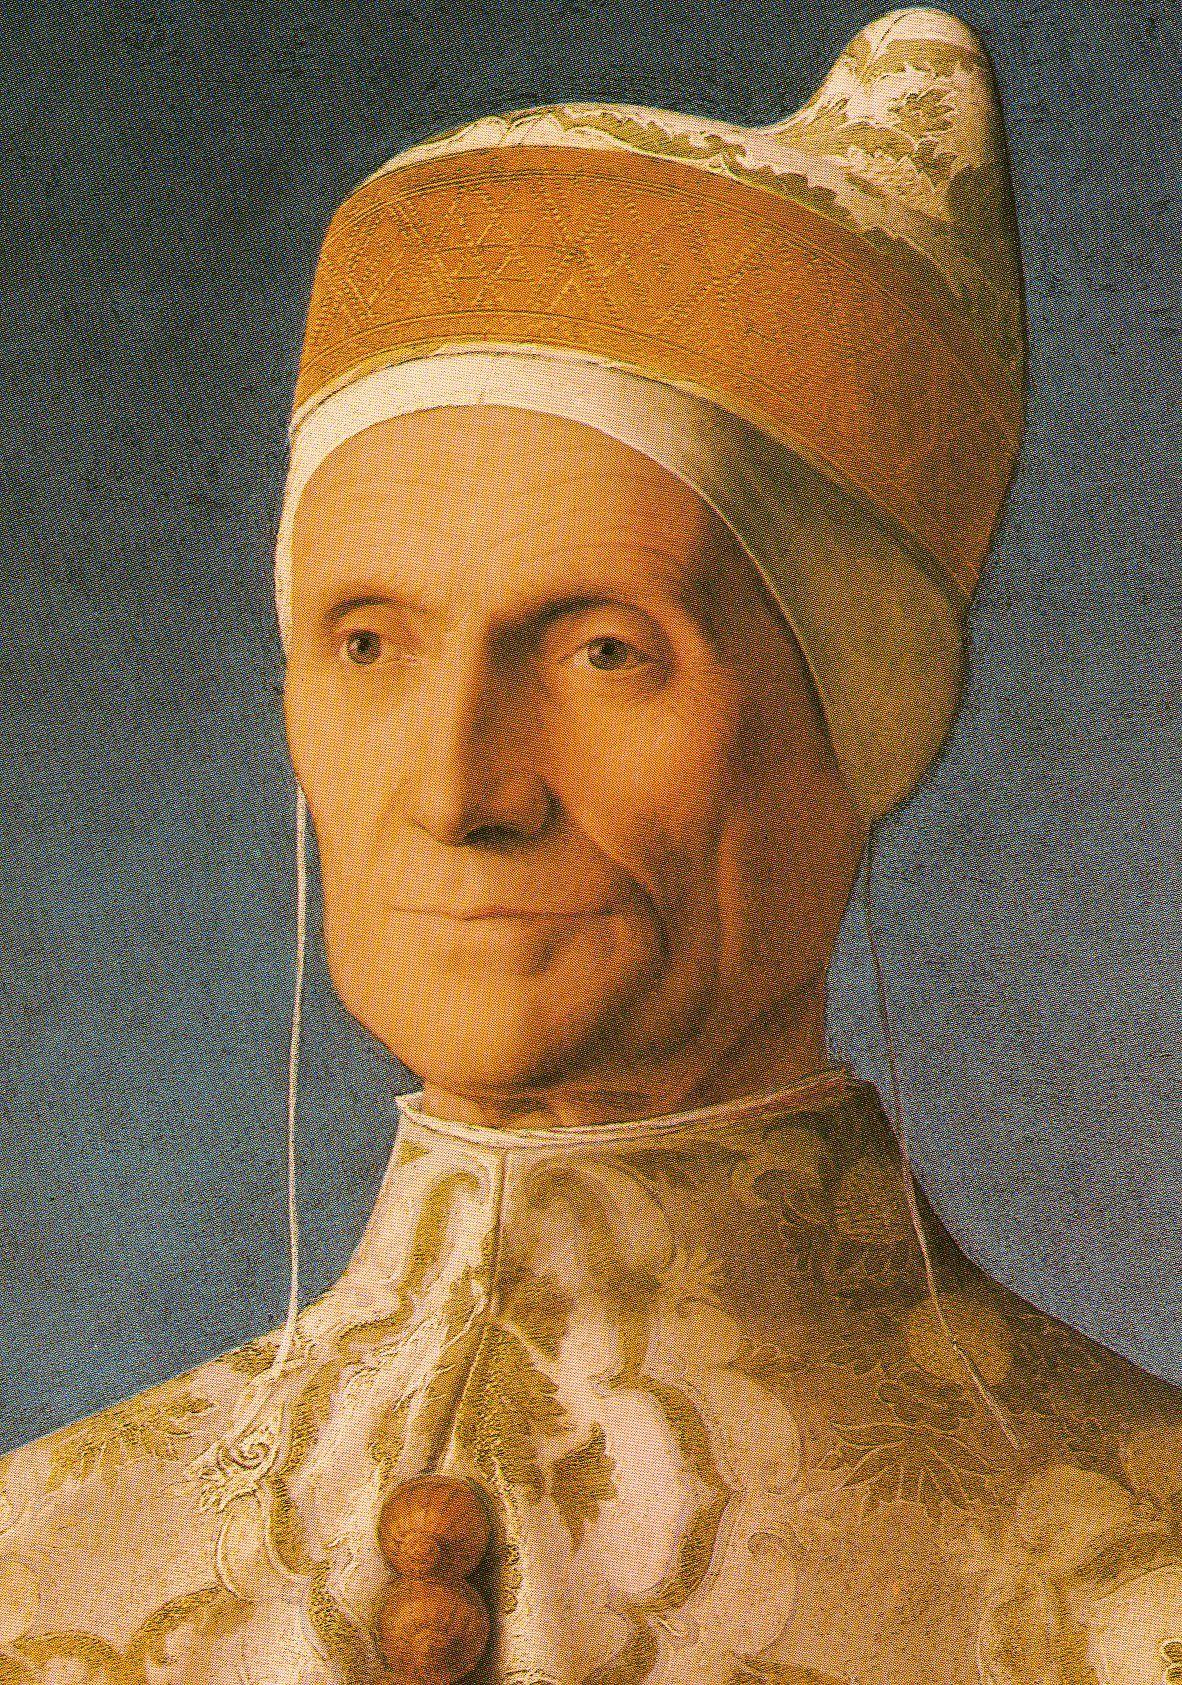 Giovanni Bellini 1427-1516. Doge Leonardo Loredan